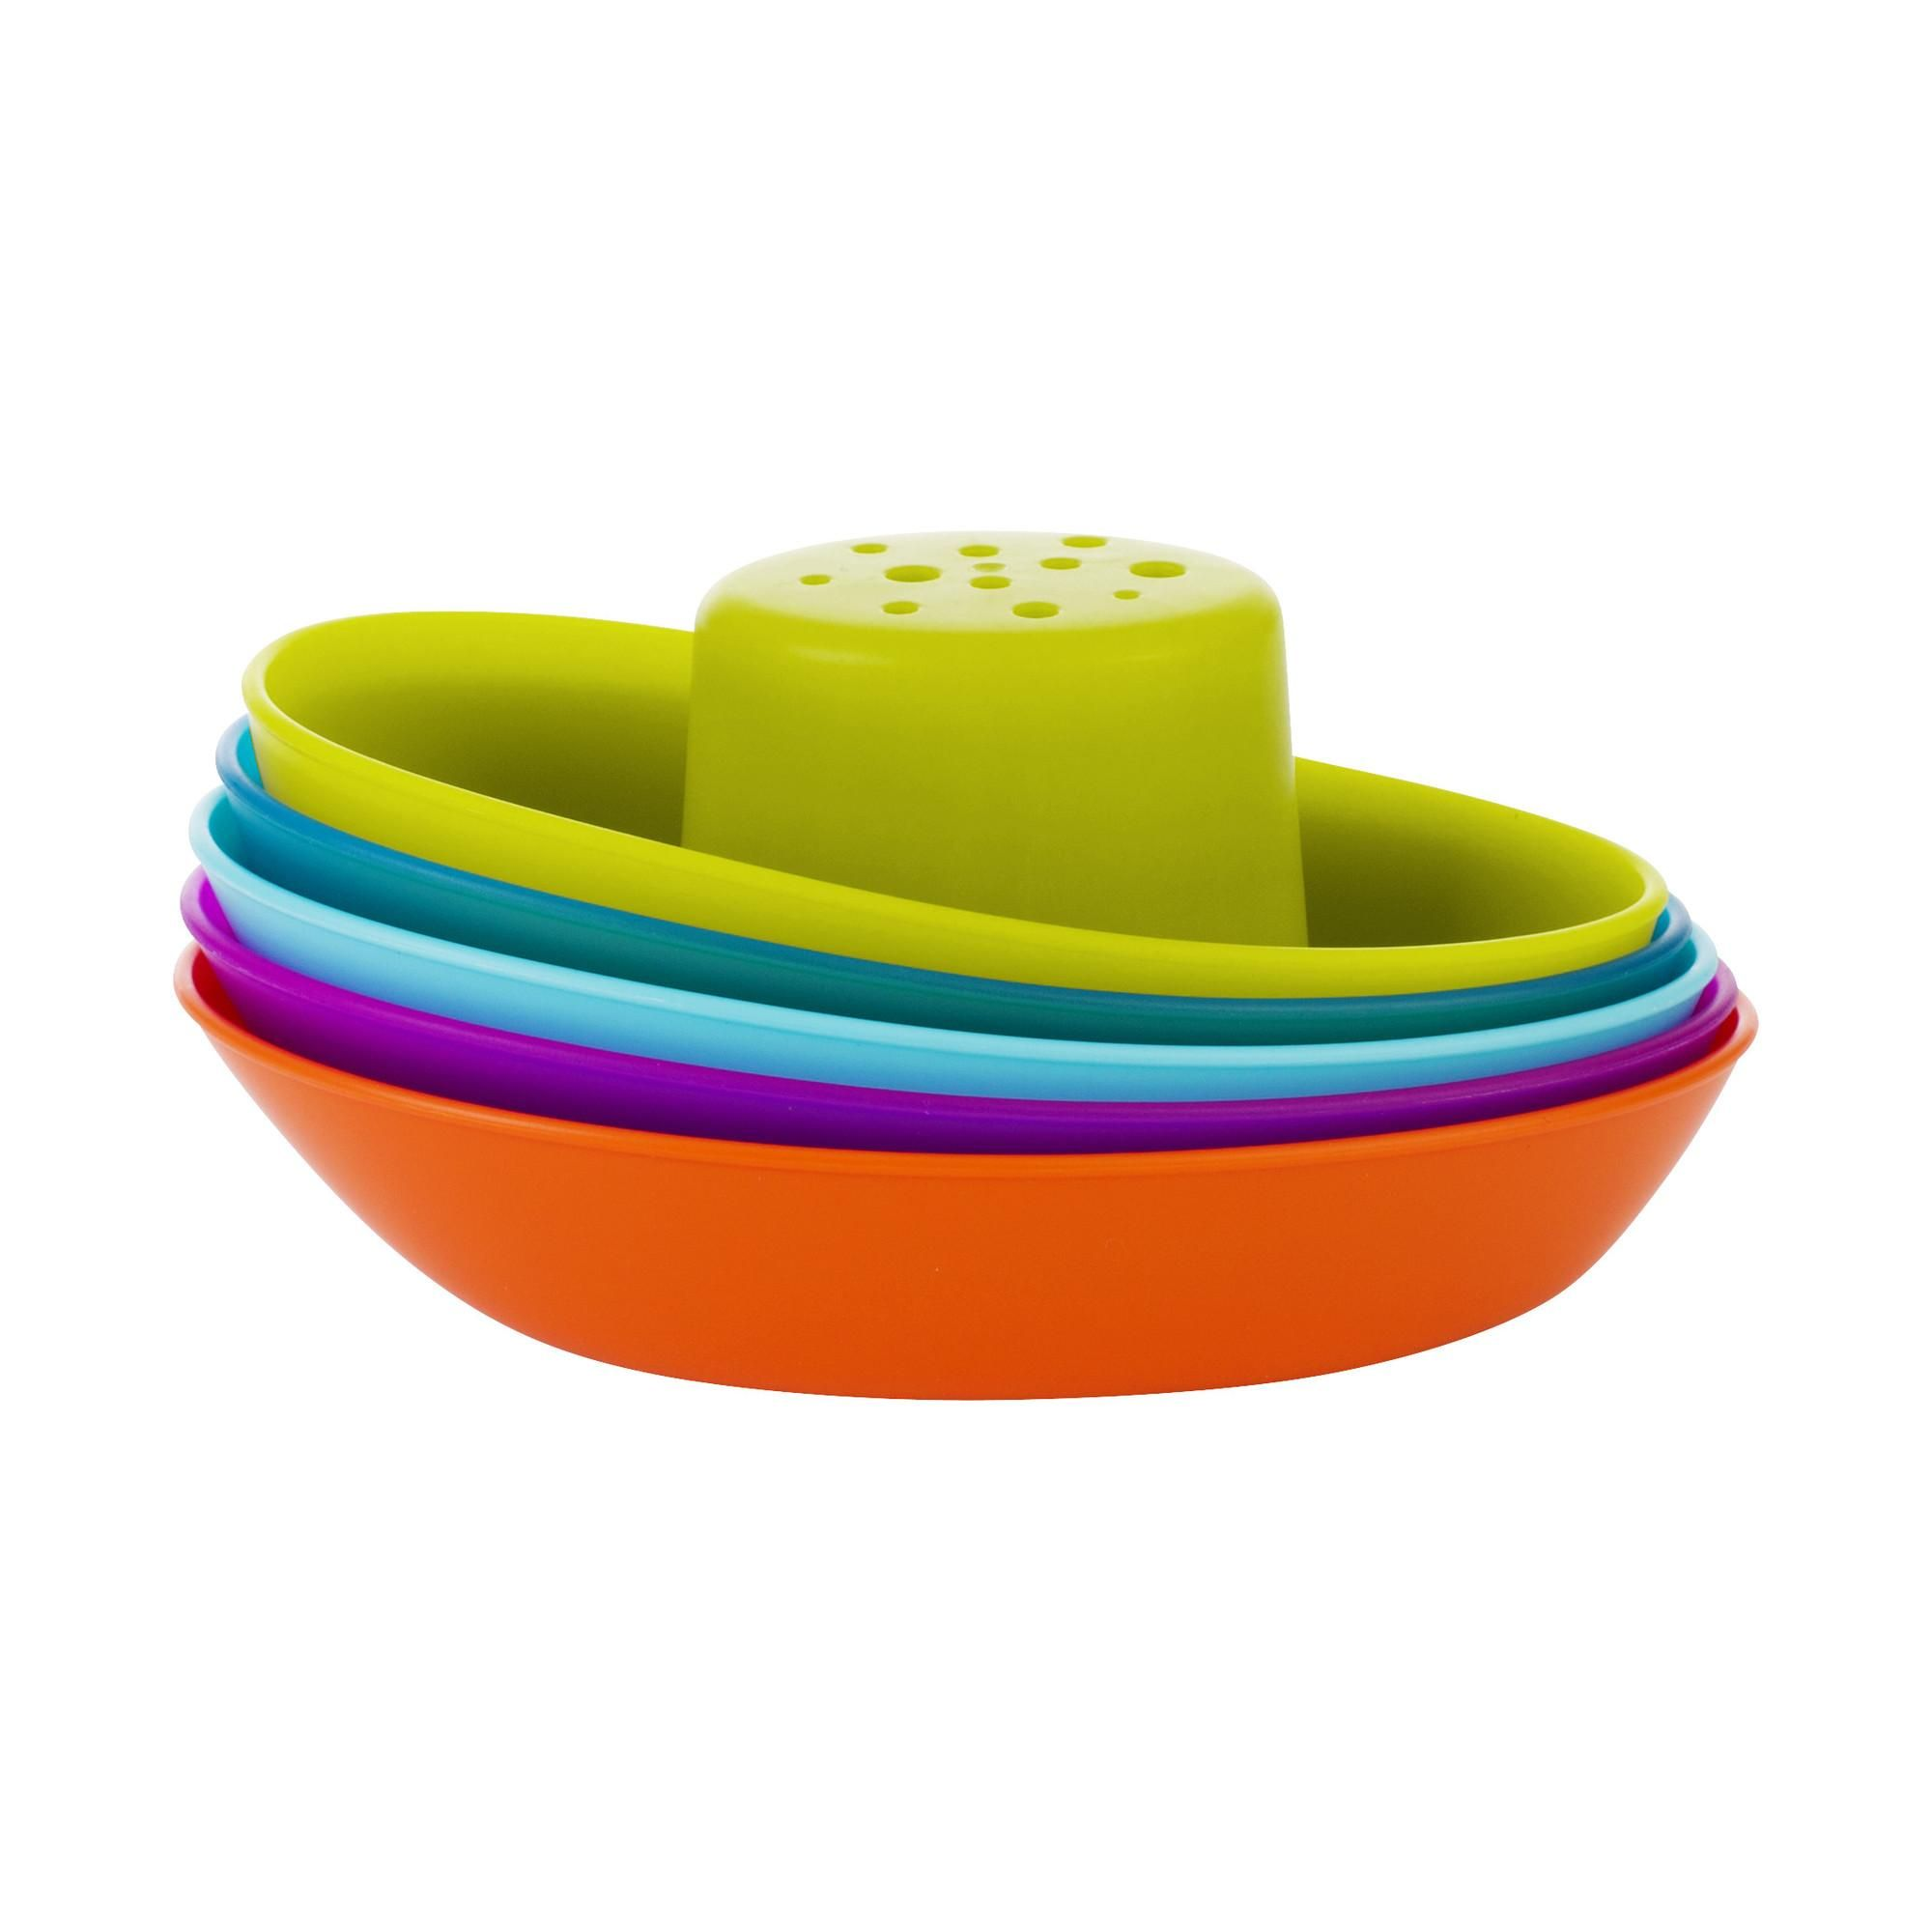 Amazon.com : Boon Fleet Stacking Boats Bathing Toy : Bathtub Toys ...